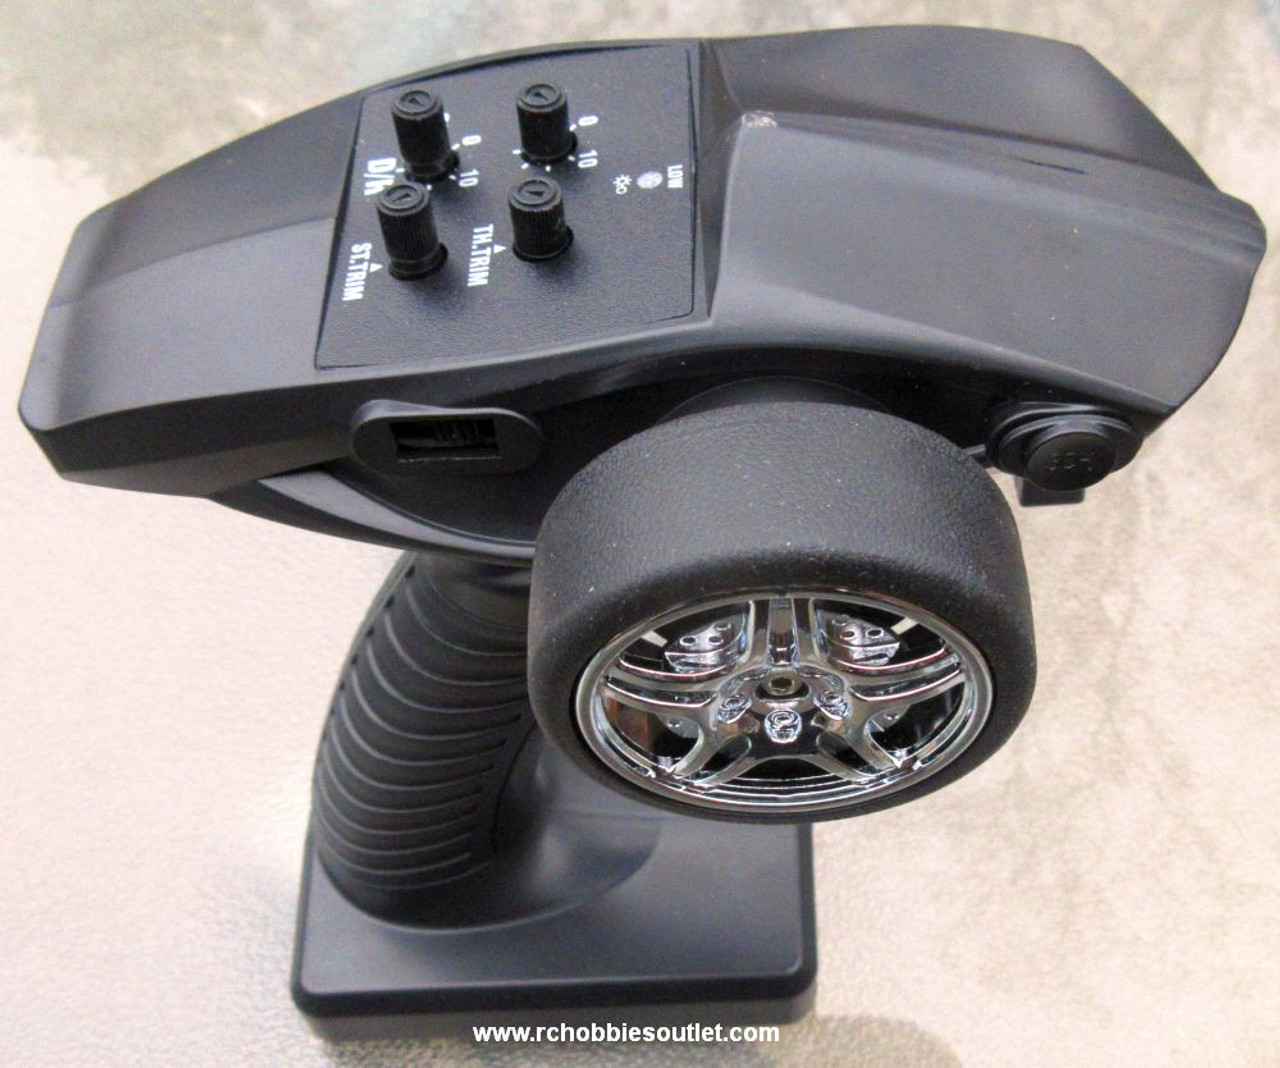 2.4G Radio System